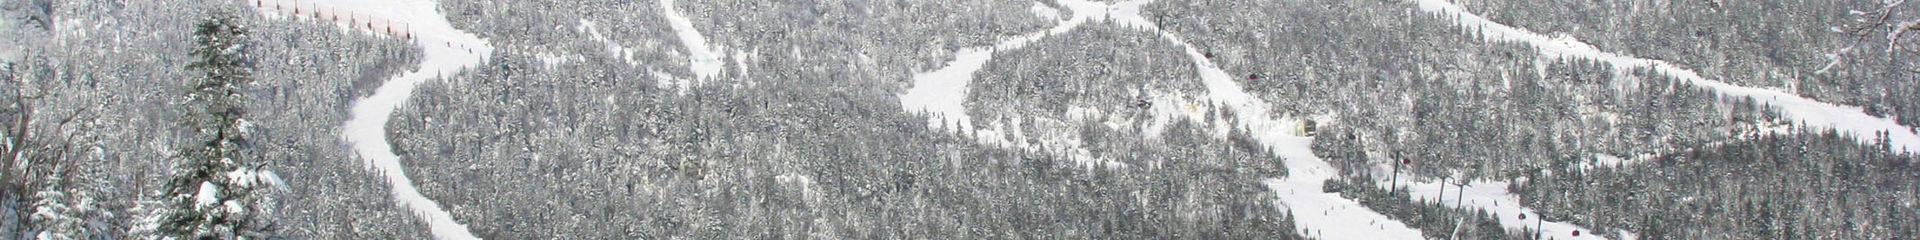 Epic Ski Resorts in the Eastern US